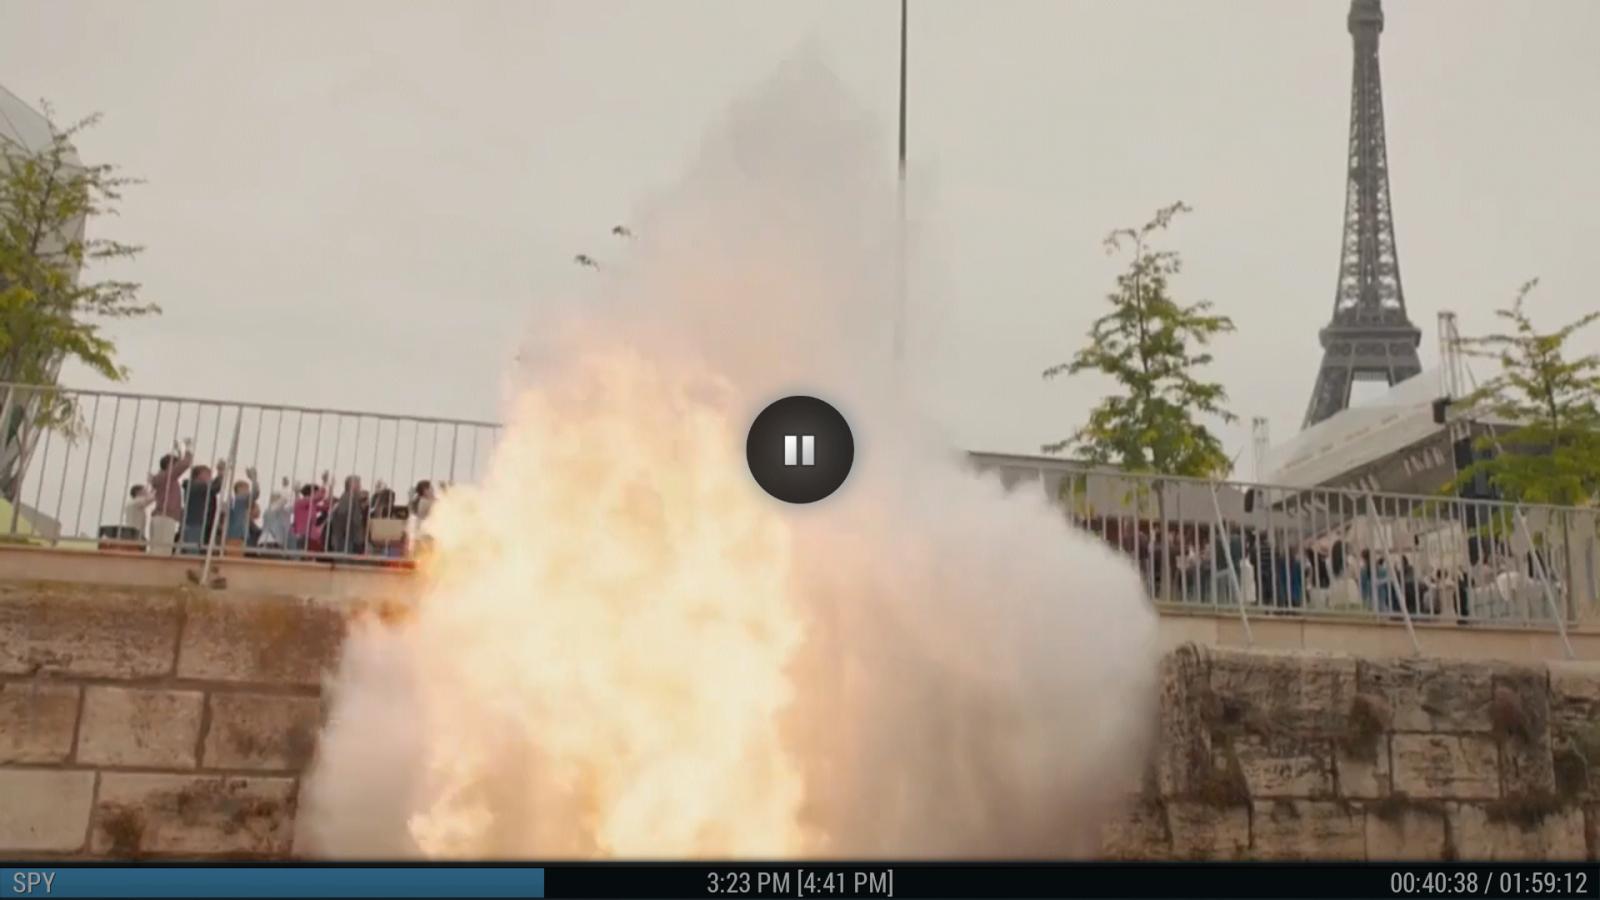 AMAZON FIRE TV STICK JAILBROKEN, XBMC KODI 15.2 MOVIES